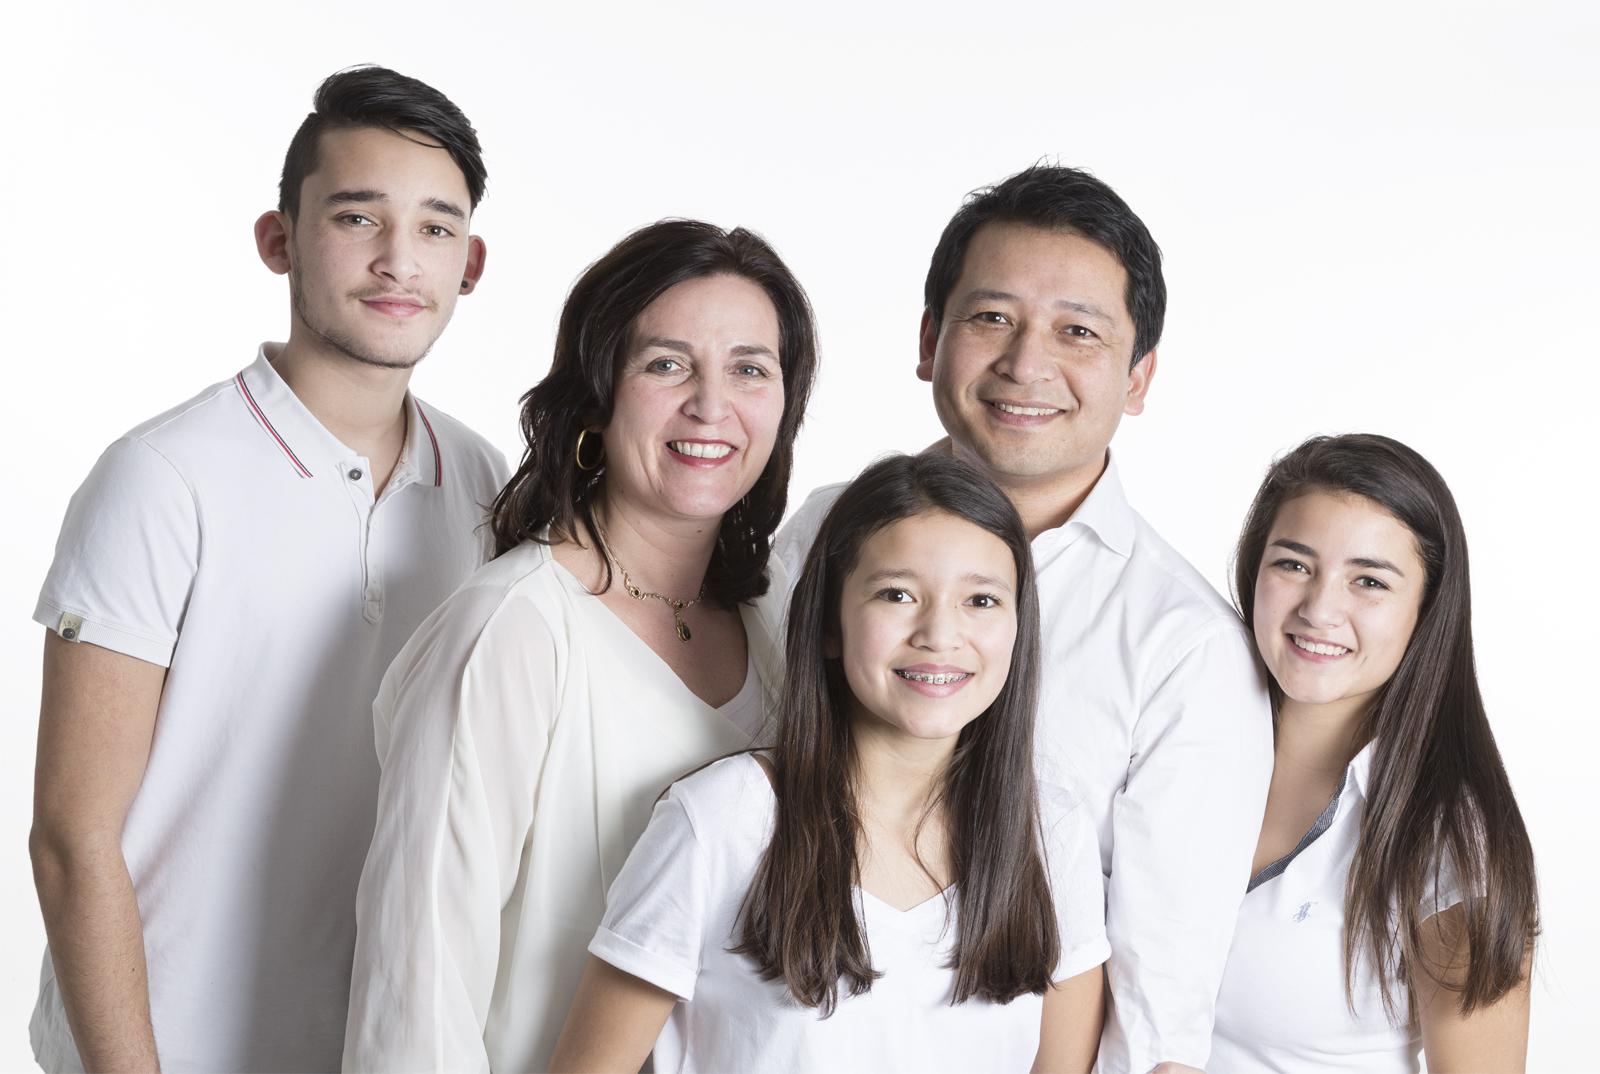 familieportret Ina Vrinssen